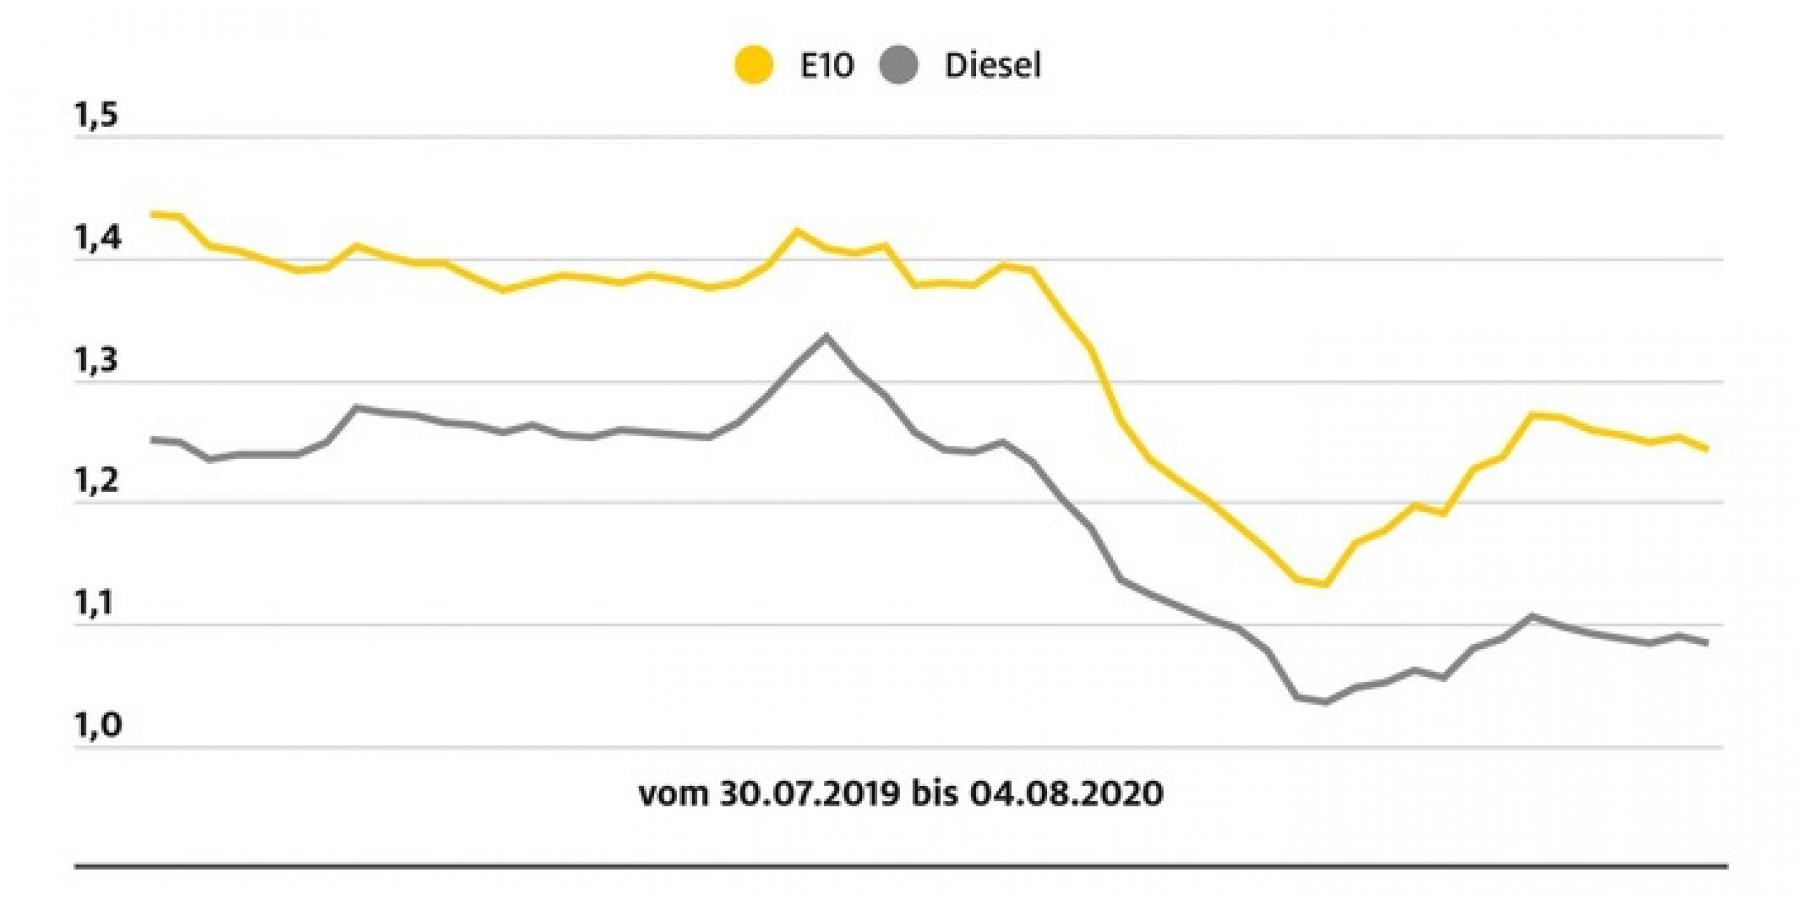 Rückgang bei den Kraftstoffpreisen Super E10 sinkt um 1,0 Cent, Diesel um 0,5 Cent